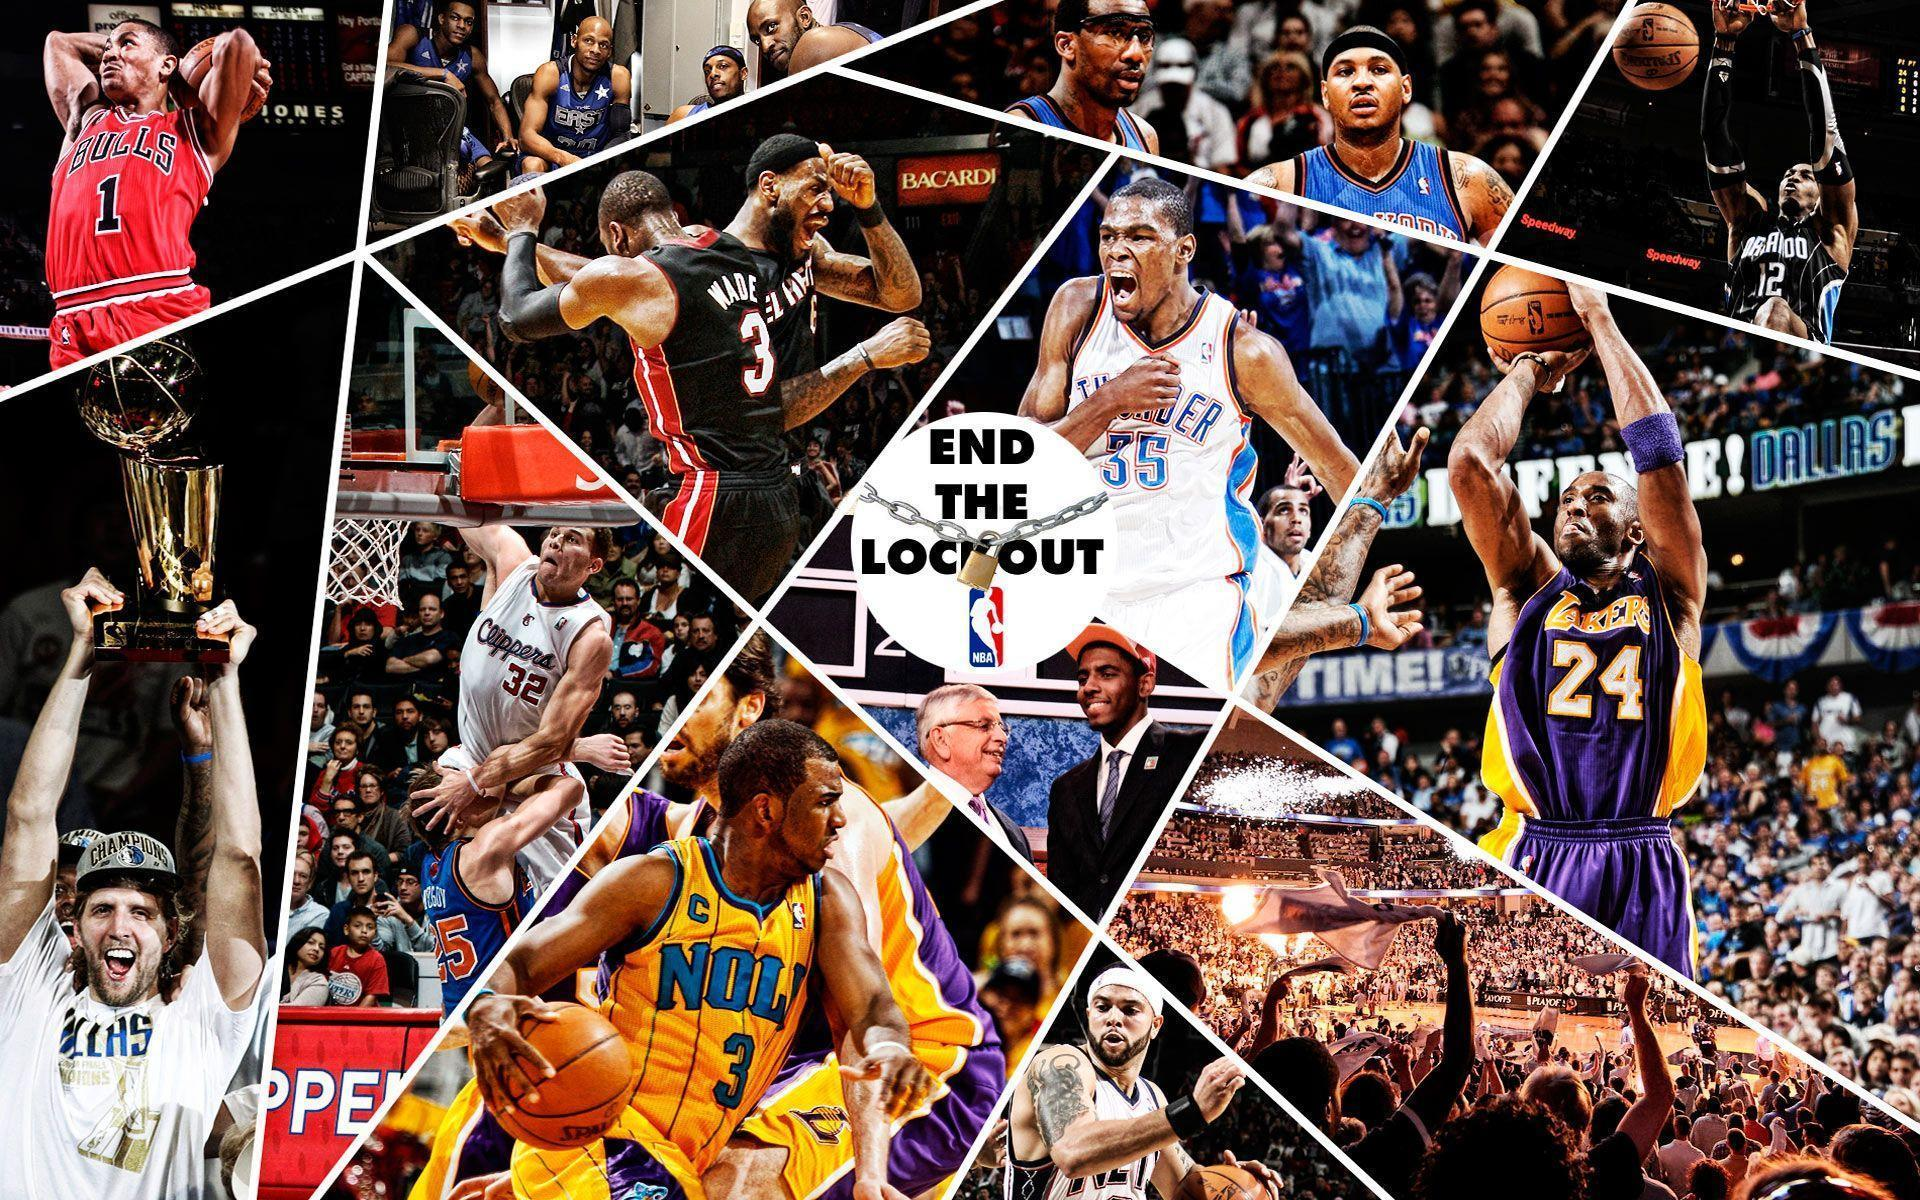 Knight Basketball Player Wallpaper